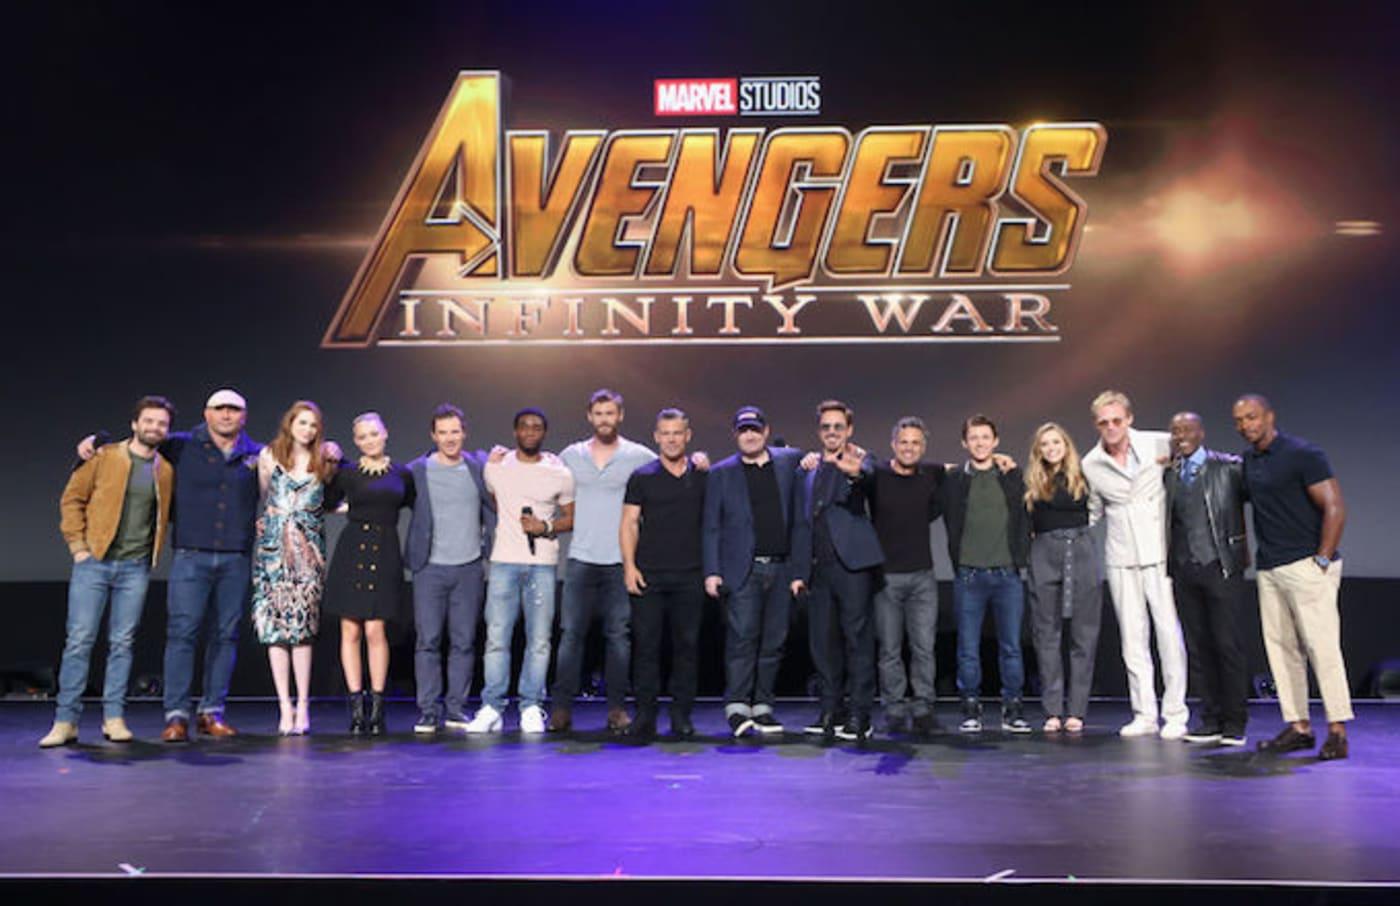 'Avengers: Infinity War' cast photo.